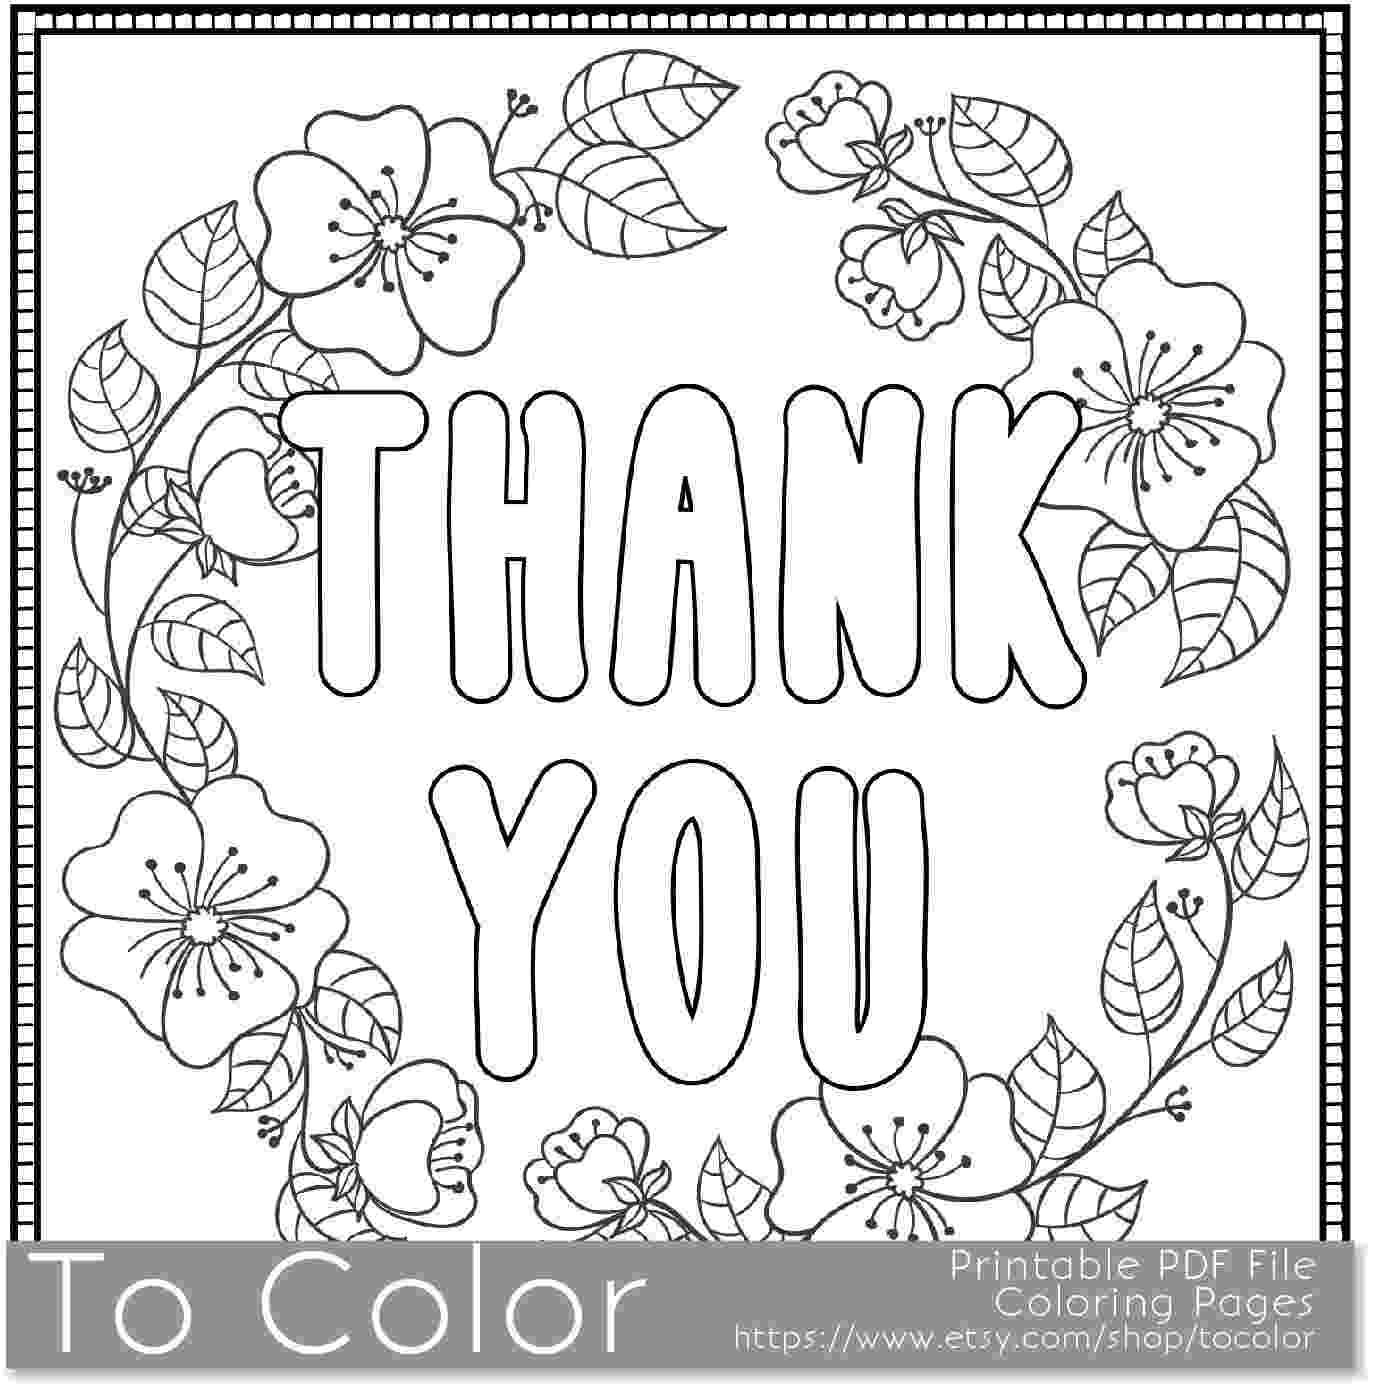 thank you coloring pages thank you coloring page twisty noodle pages you coloring thank